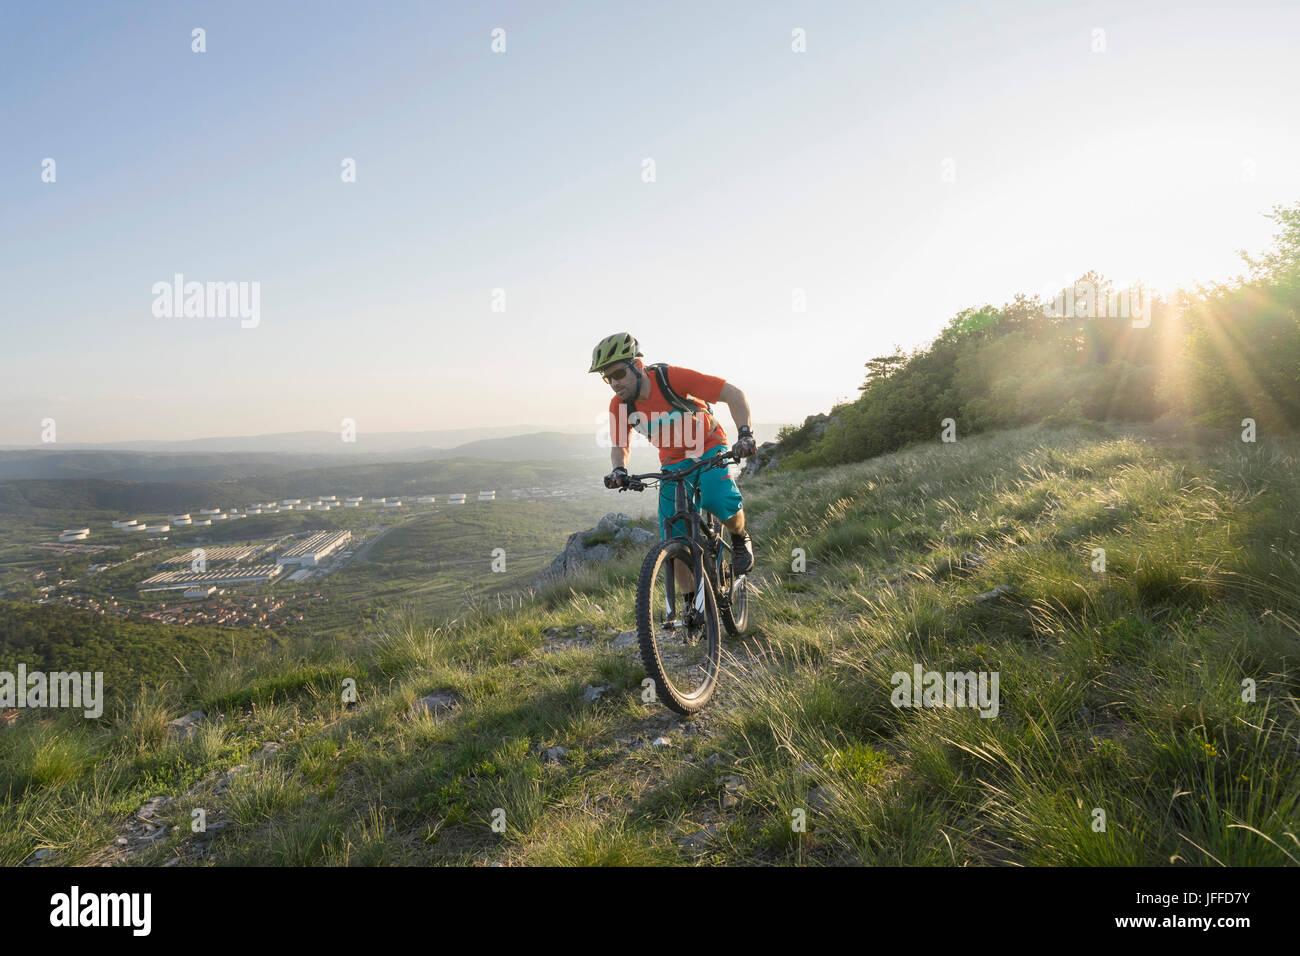 Mature man riding mountain bike on hill - Stock Image